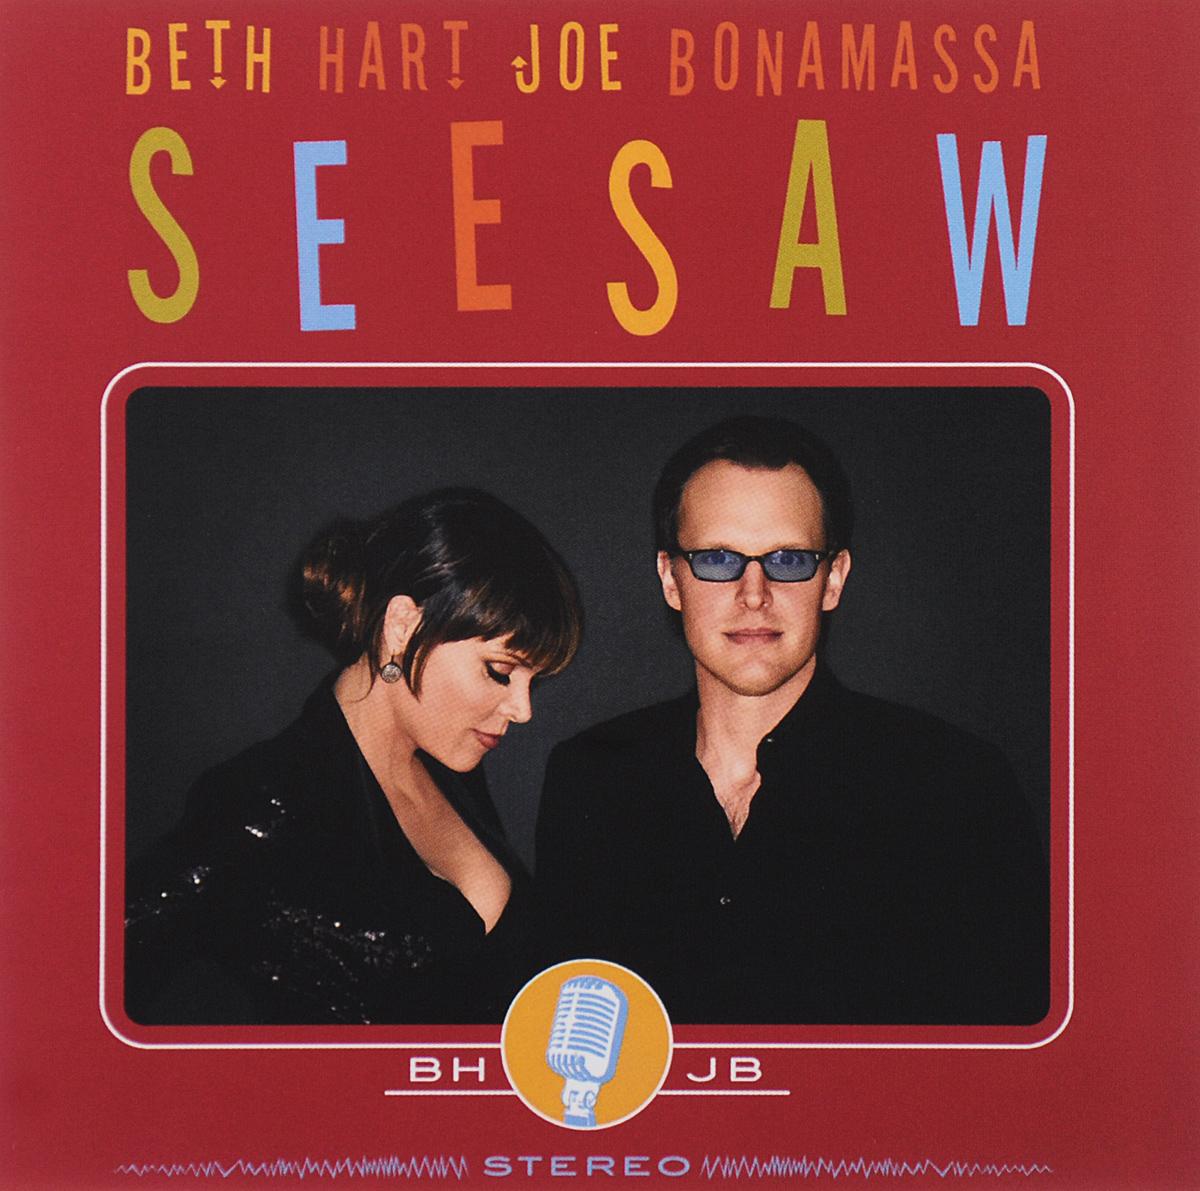 Бет Хат,Джо Бонамасса Beth Hart, Joe Bonamassa. Seesaw (CD+DVD) музыка cd dvd cd dvd seiko matsuda chris hart